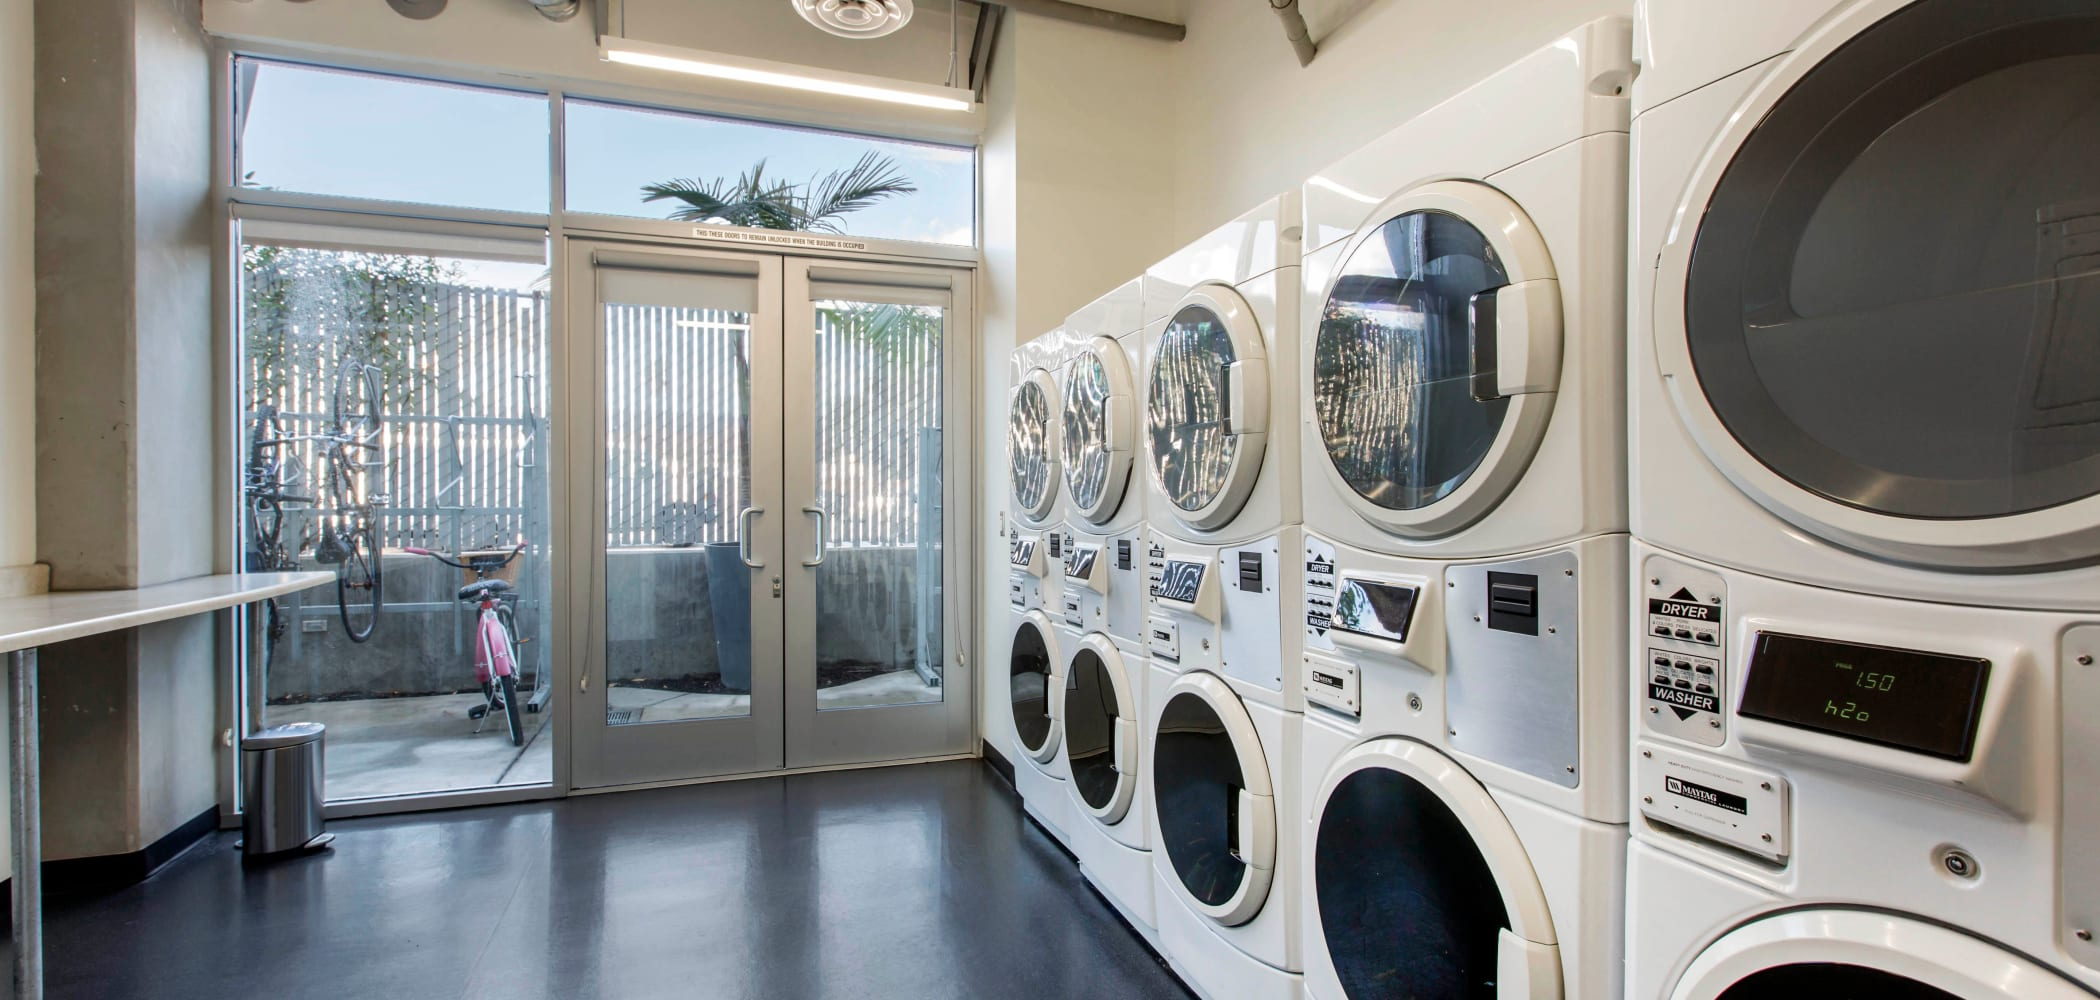 Onsite laundry facility at ICON in Isla Vista, California